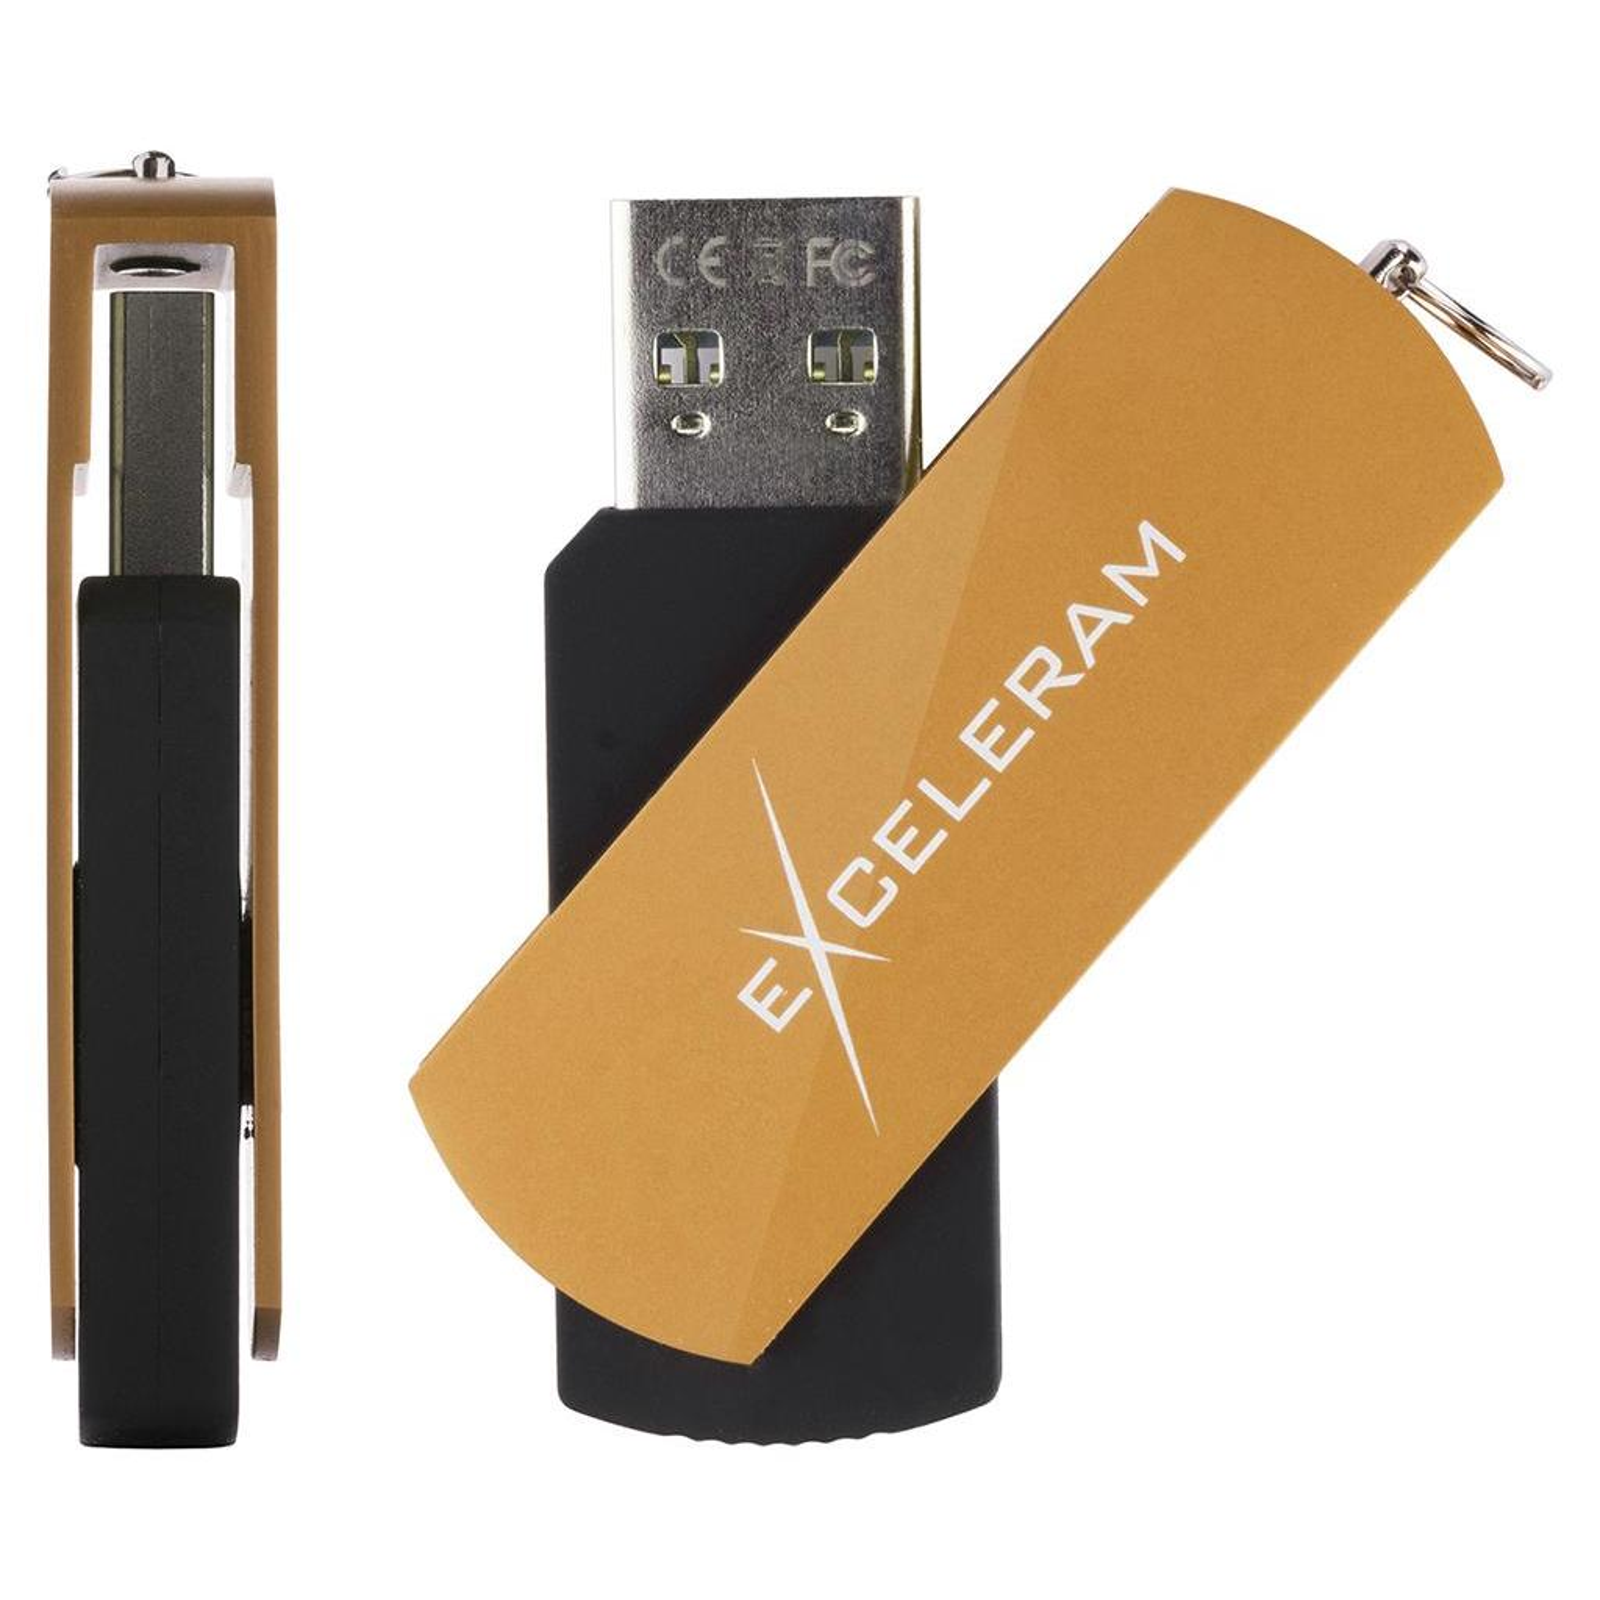 USB флеш накопитель eXceleram 32GB P2 Series Black/Black USB 3.1 Gen 1 (EXP2U3BB32) изображение 4